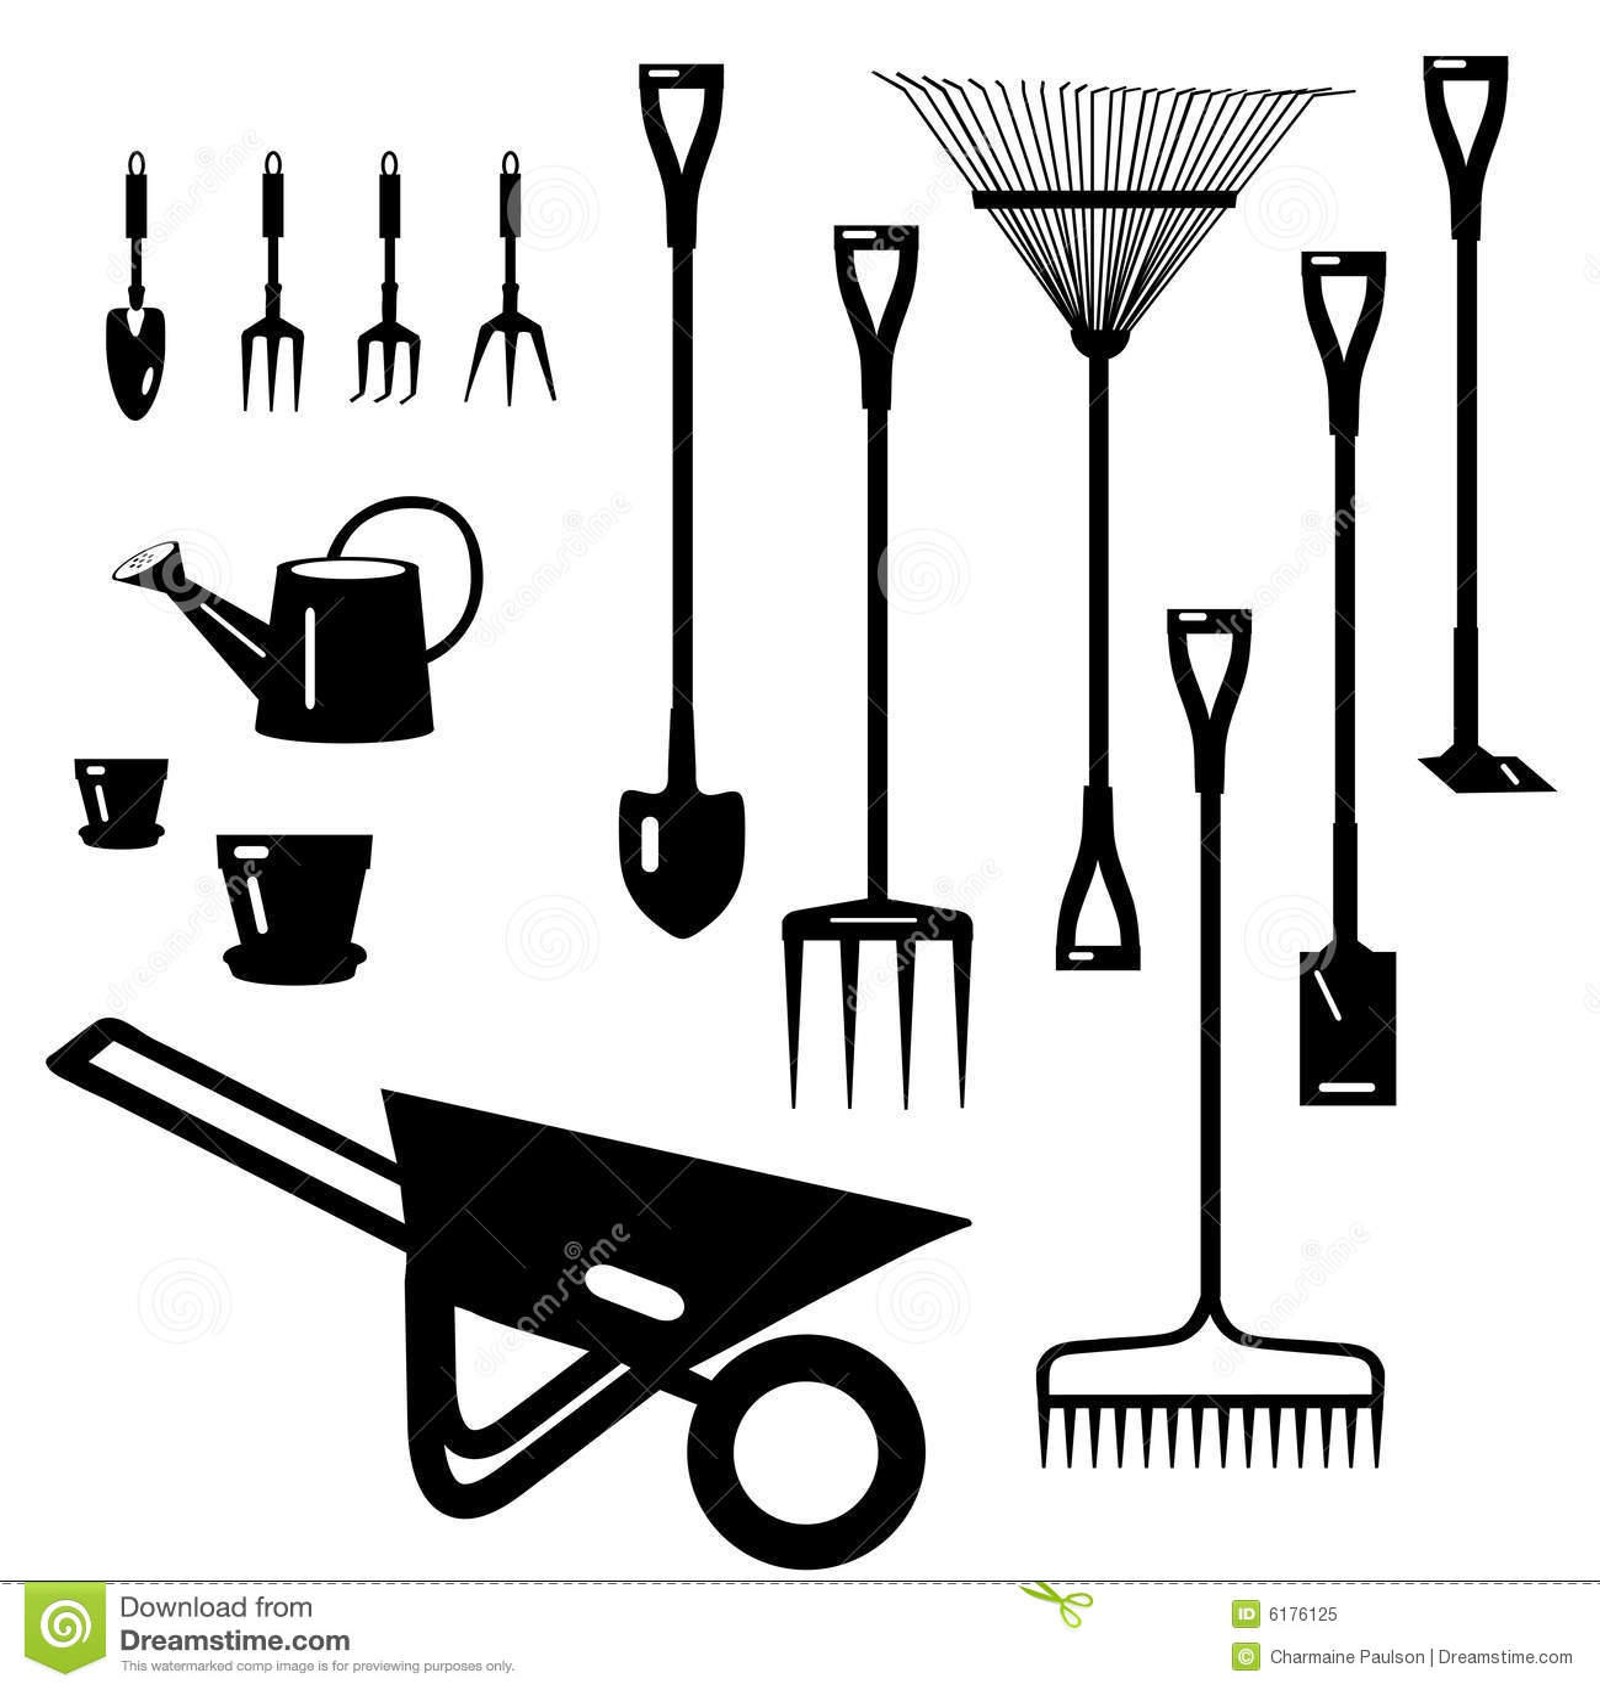 ramassage d 39 outils de jardin illustration de vecteur illustration du groupe amical 6176125. Black Bedroom Furniture Sets. Home Design Ideas